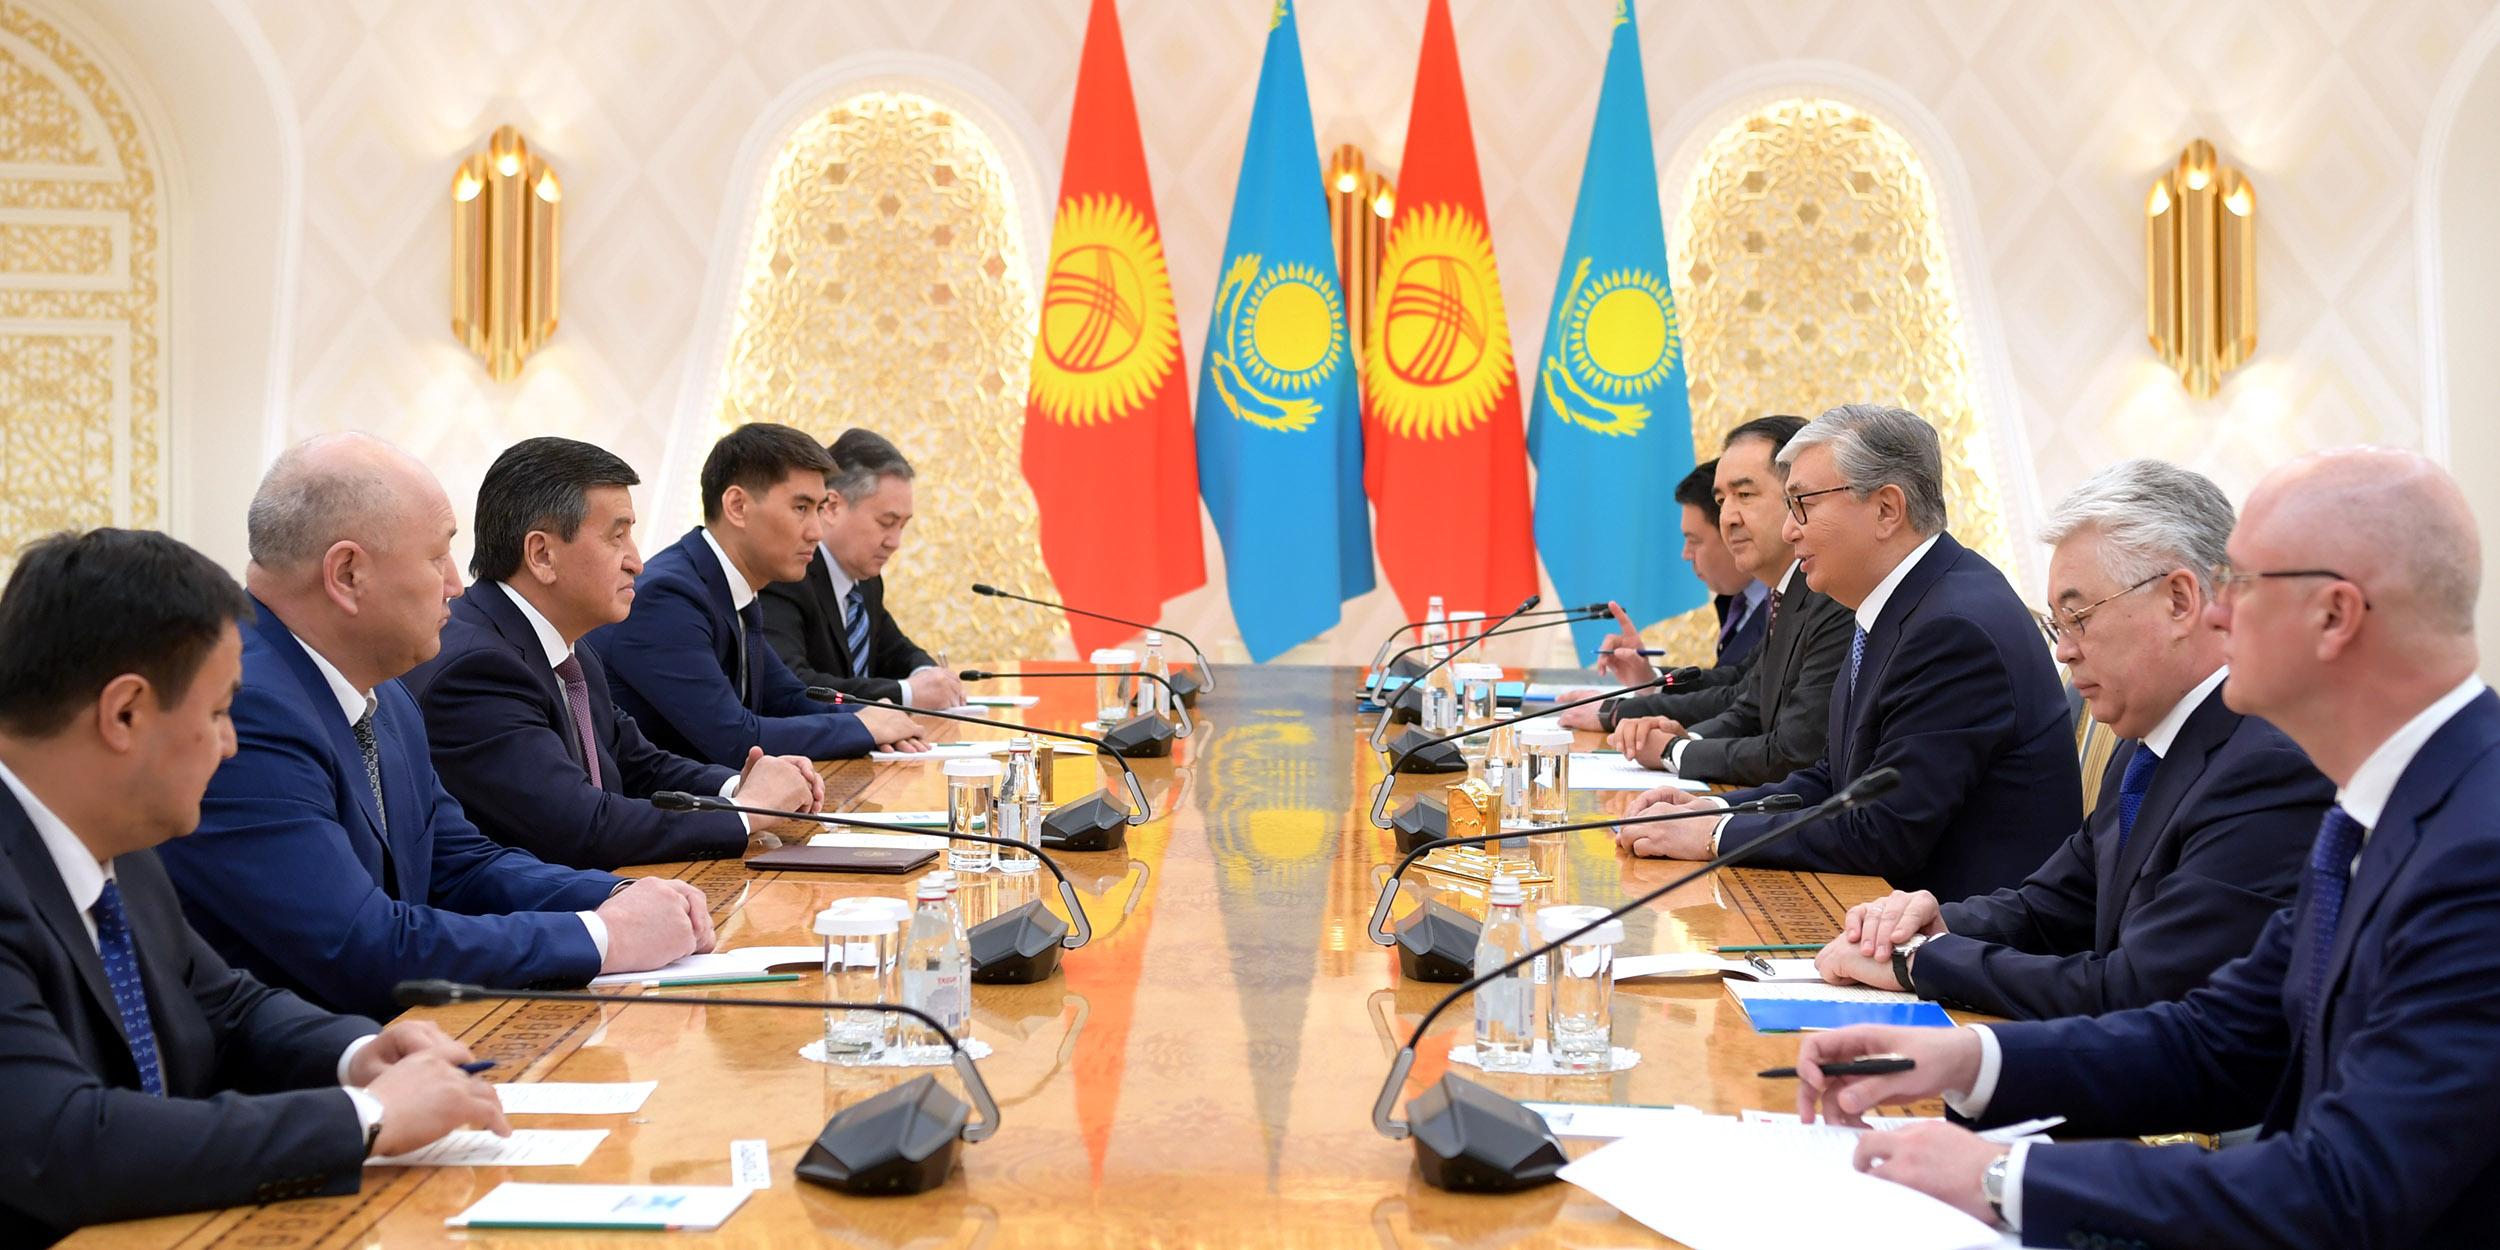 Касым-Жомарт Токаев встретился с президентами Кыргызстана и Беларуси